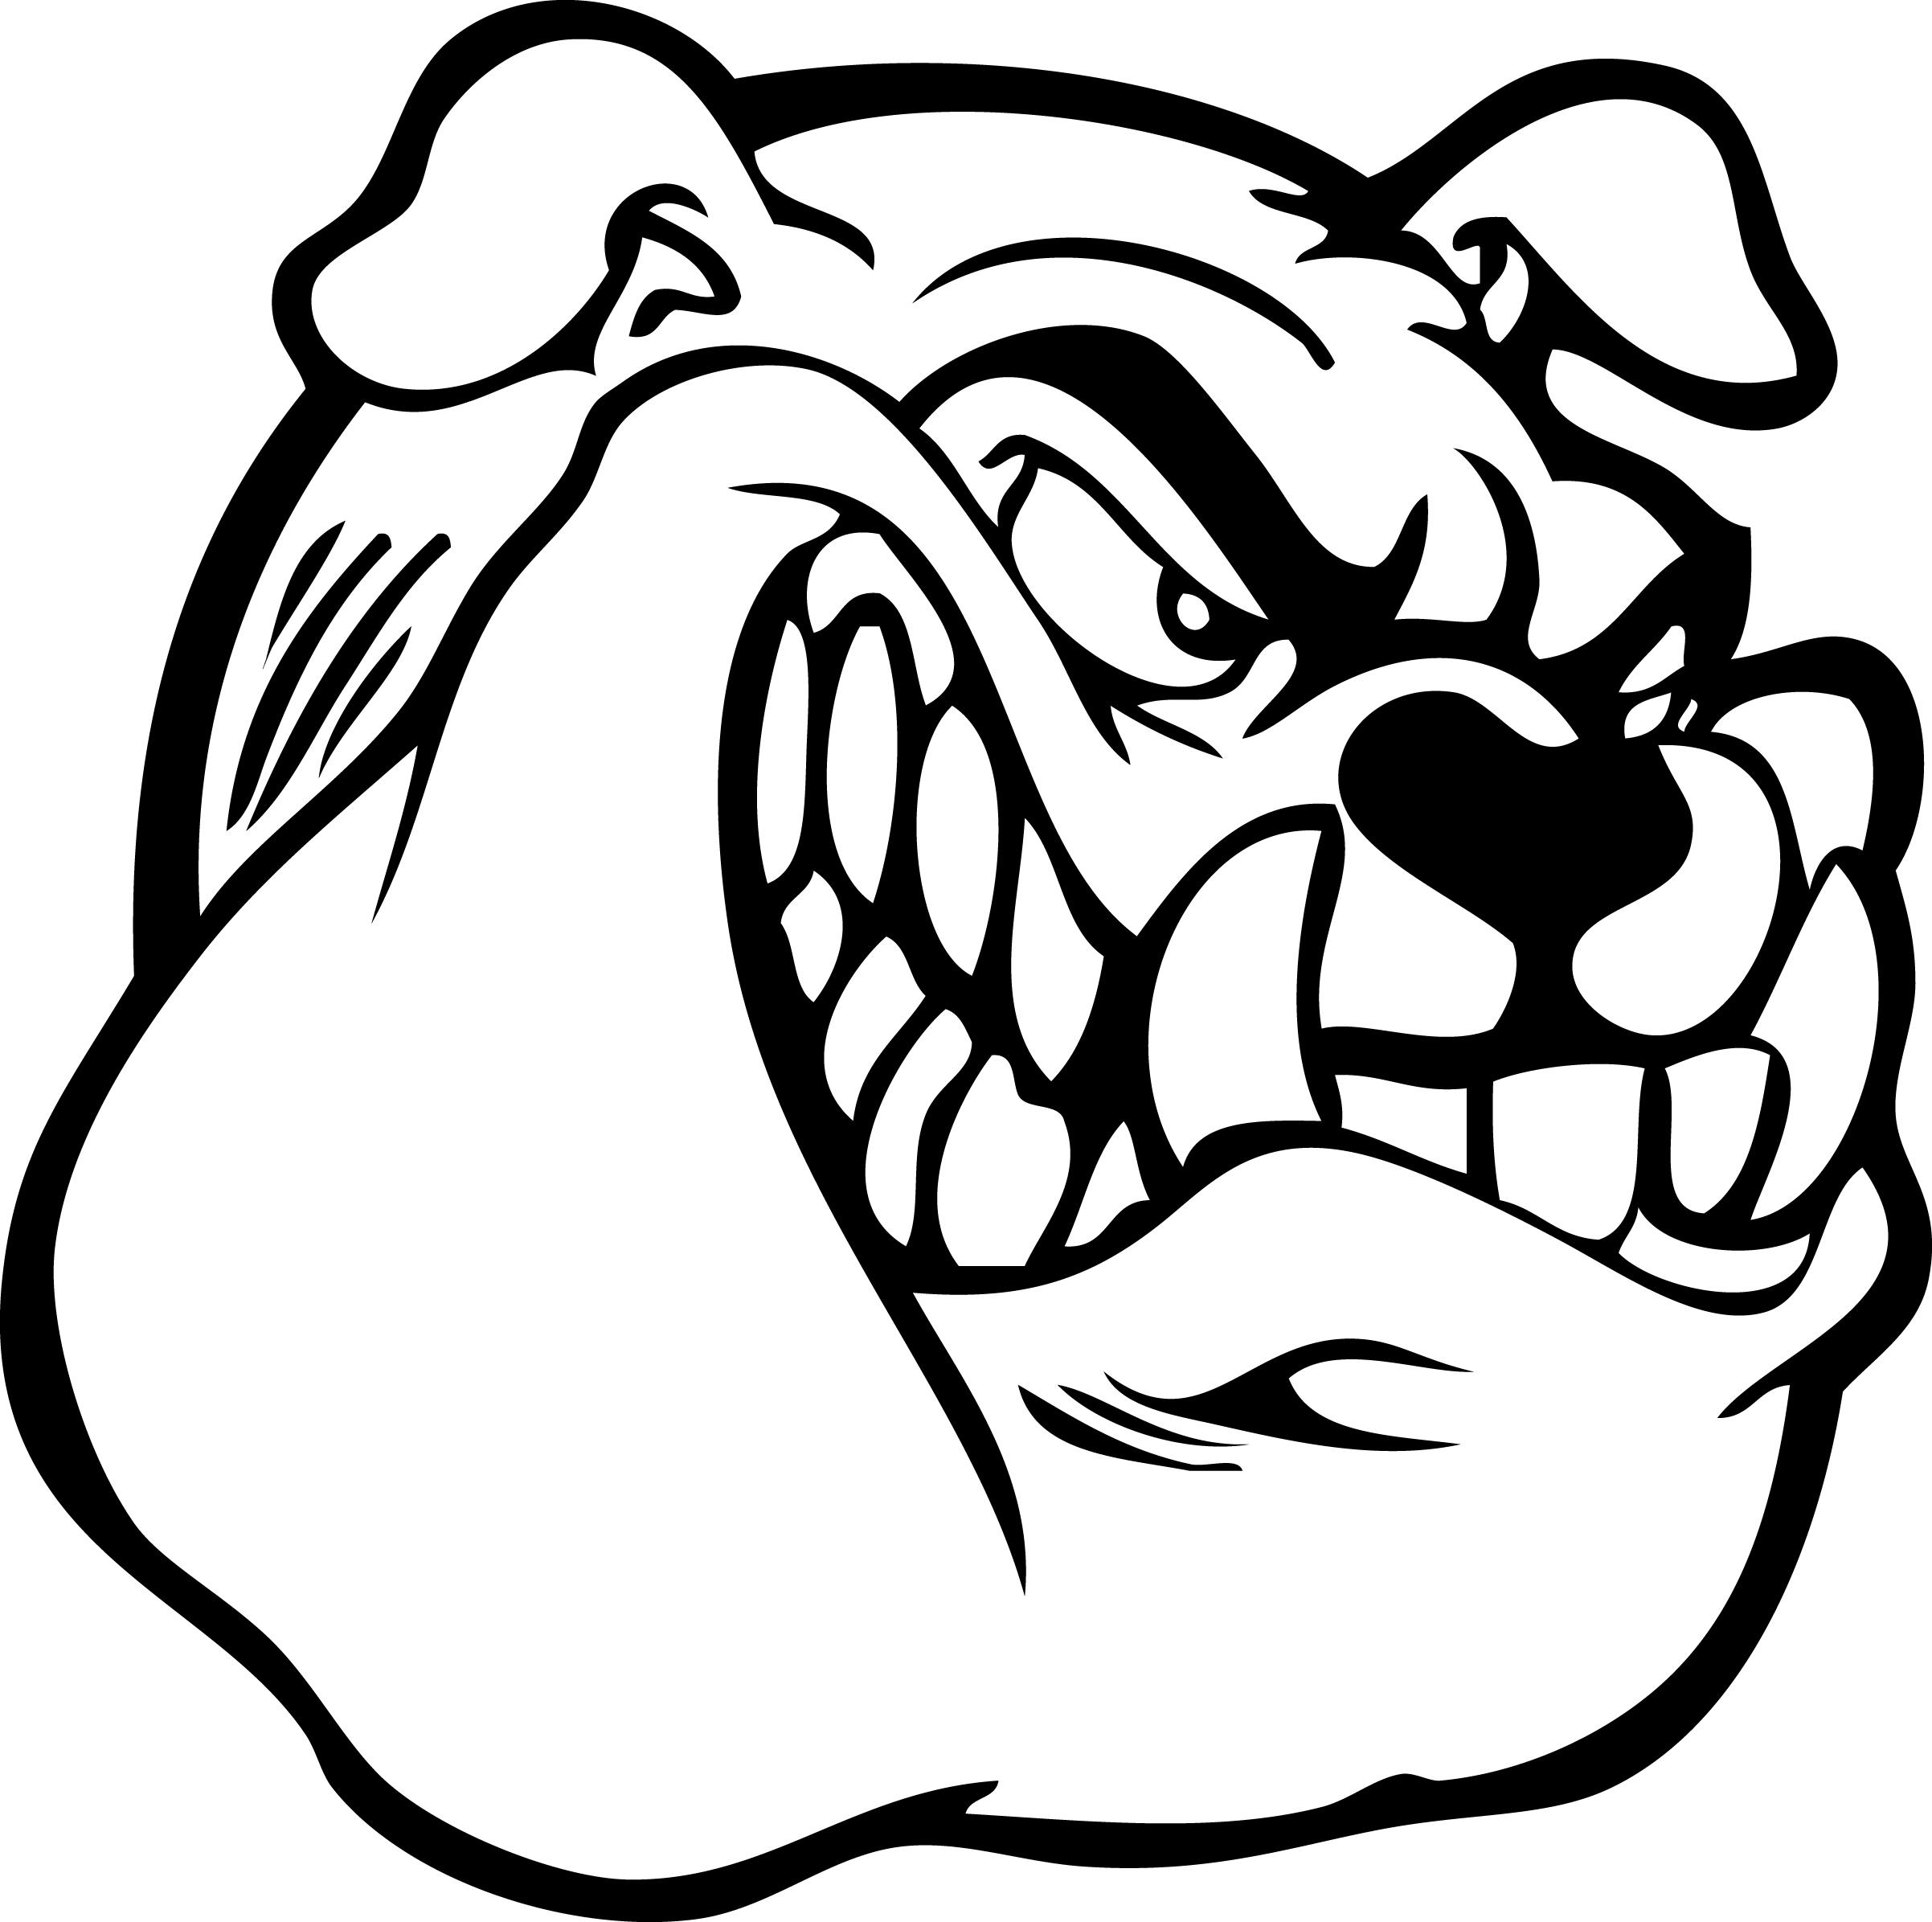 Bulldog Mascots Clipart Free Download Best Bulldog Mascots Clipart